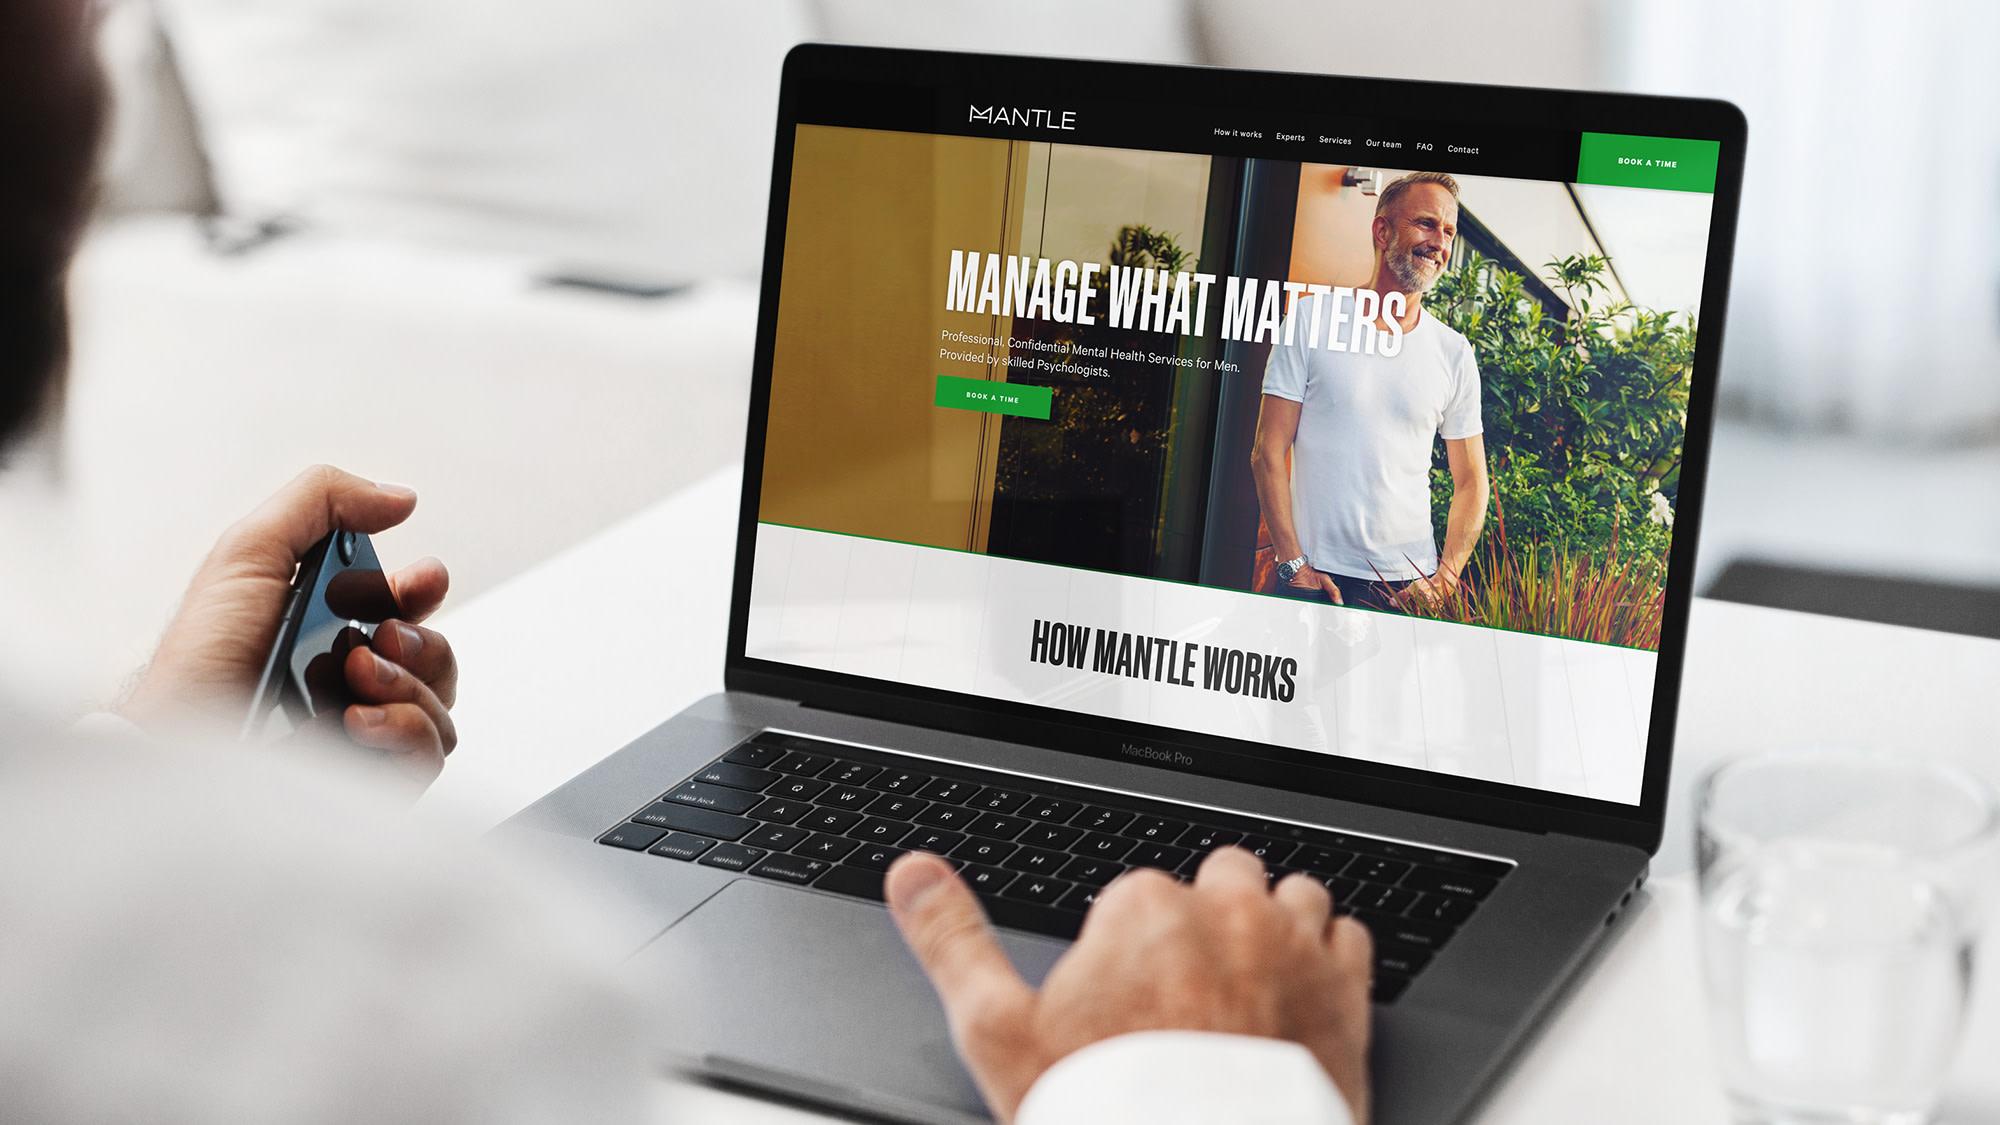 mantle health on laptop